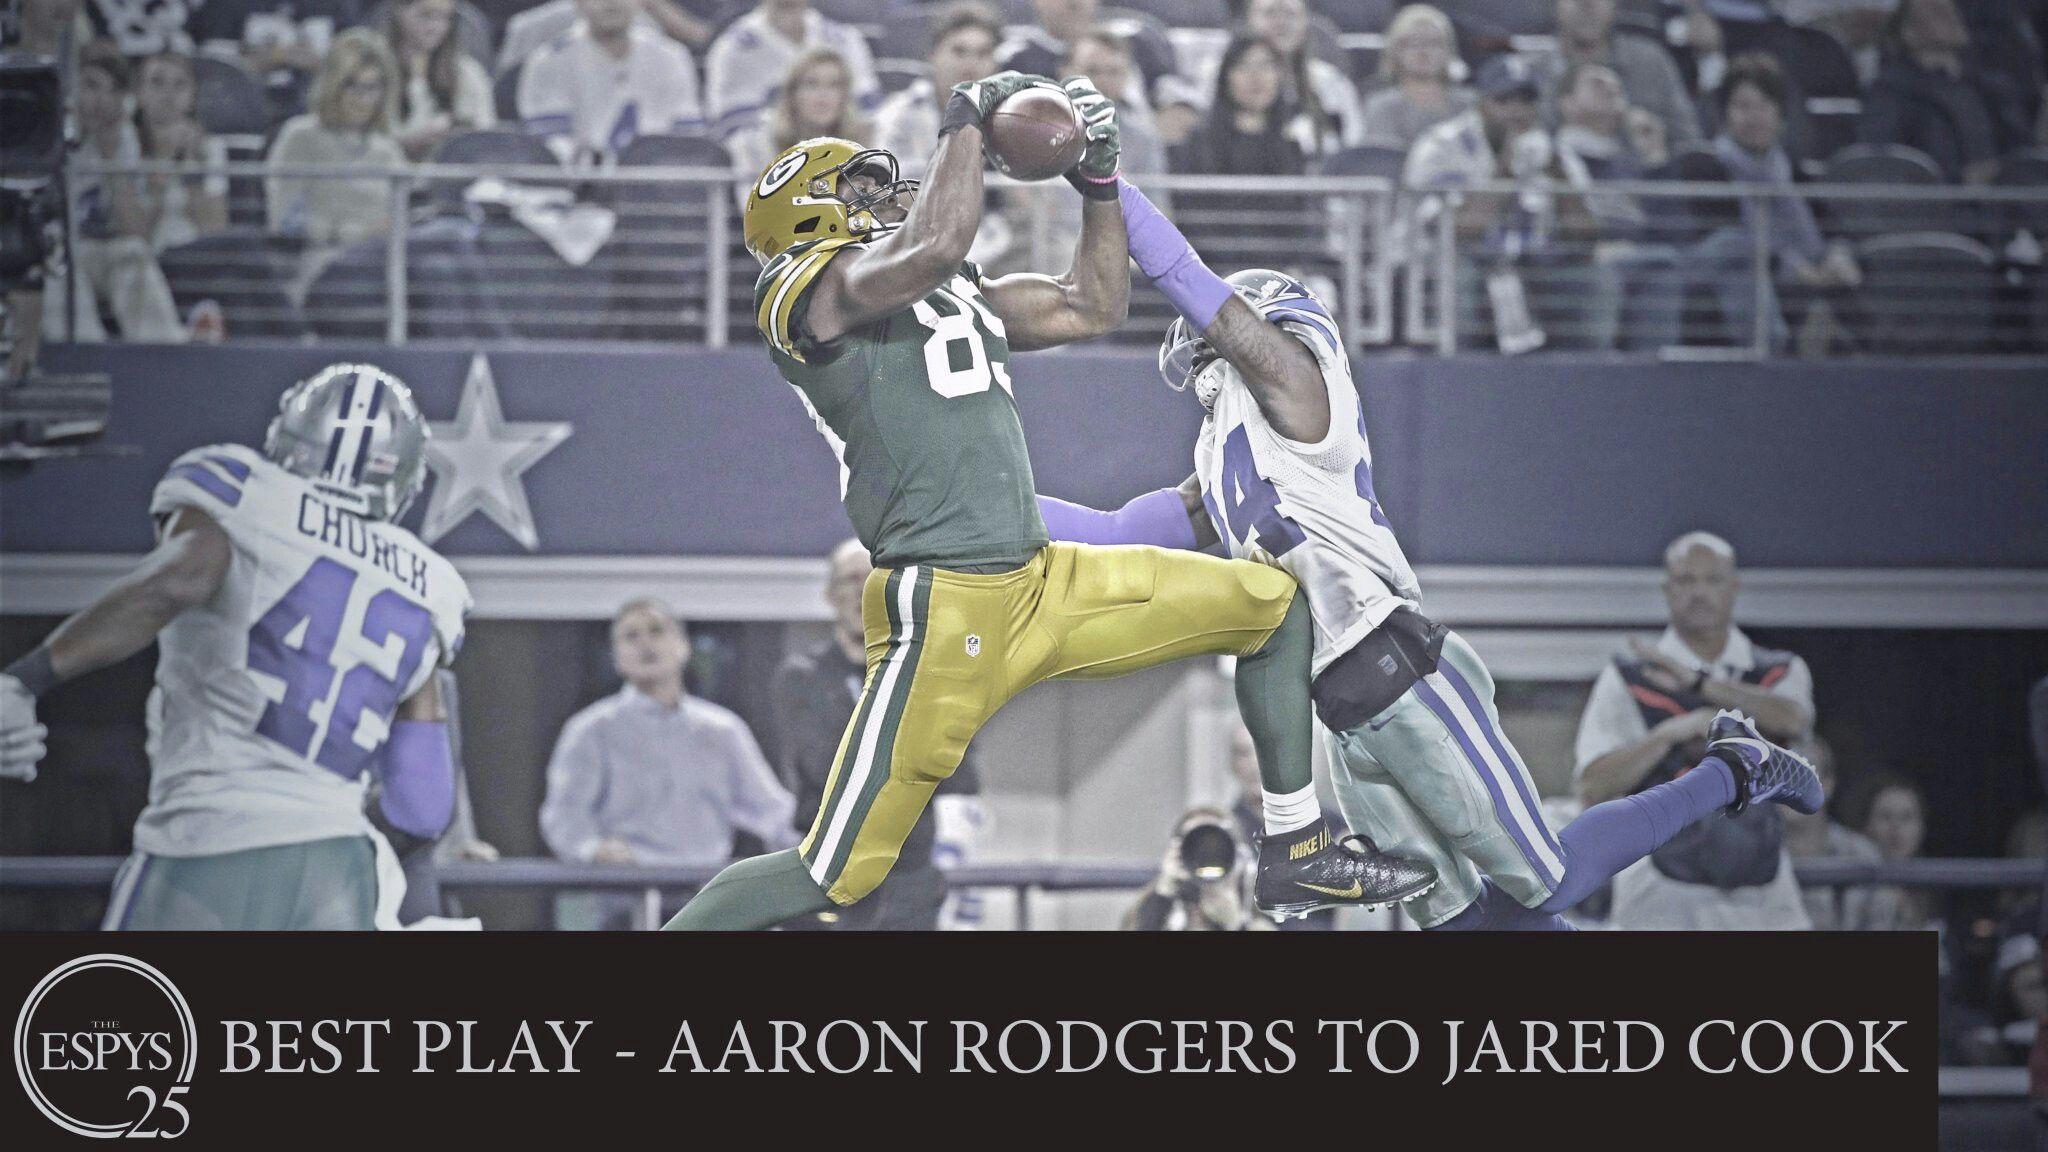 Aaron Rodgers Jared Cook 2017 Espy Winners For Best Play Jared Cook Aaron Rodgers Green Bay Packers